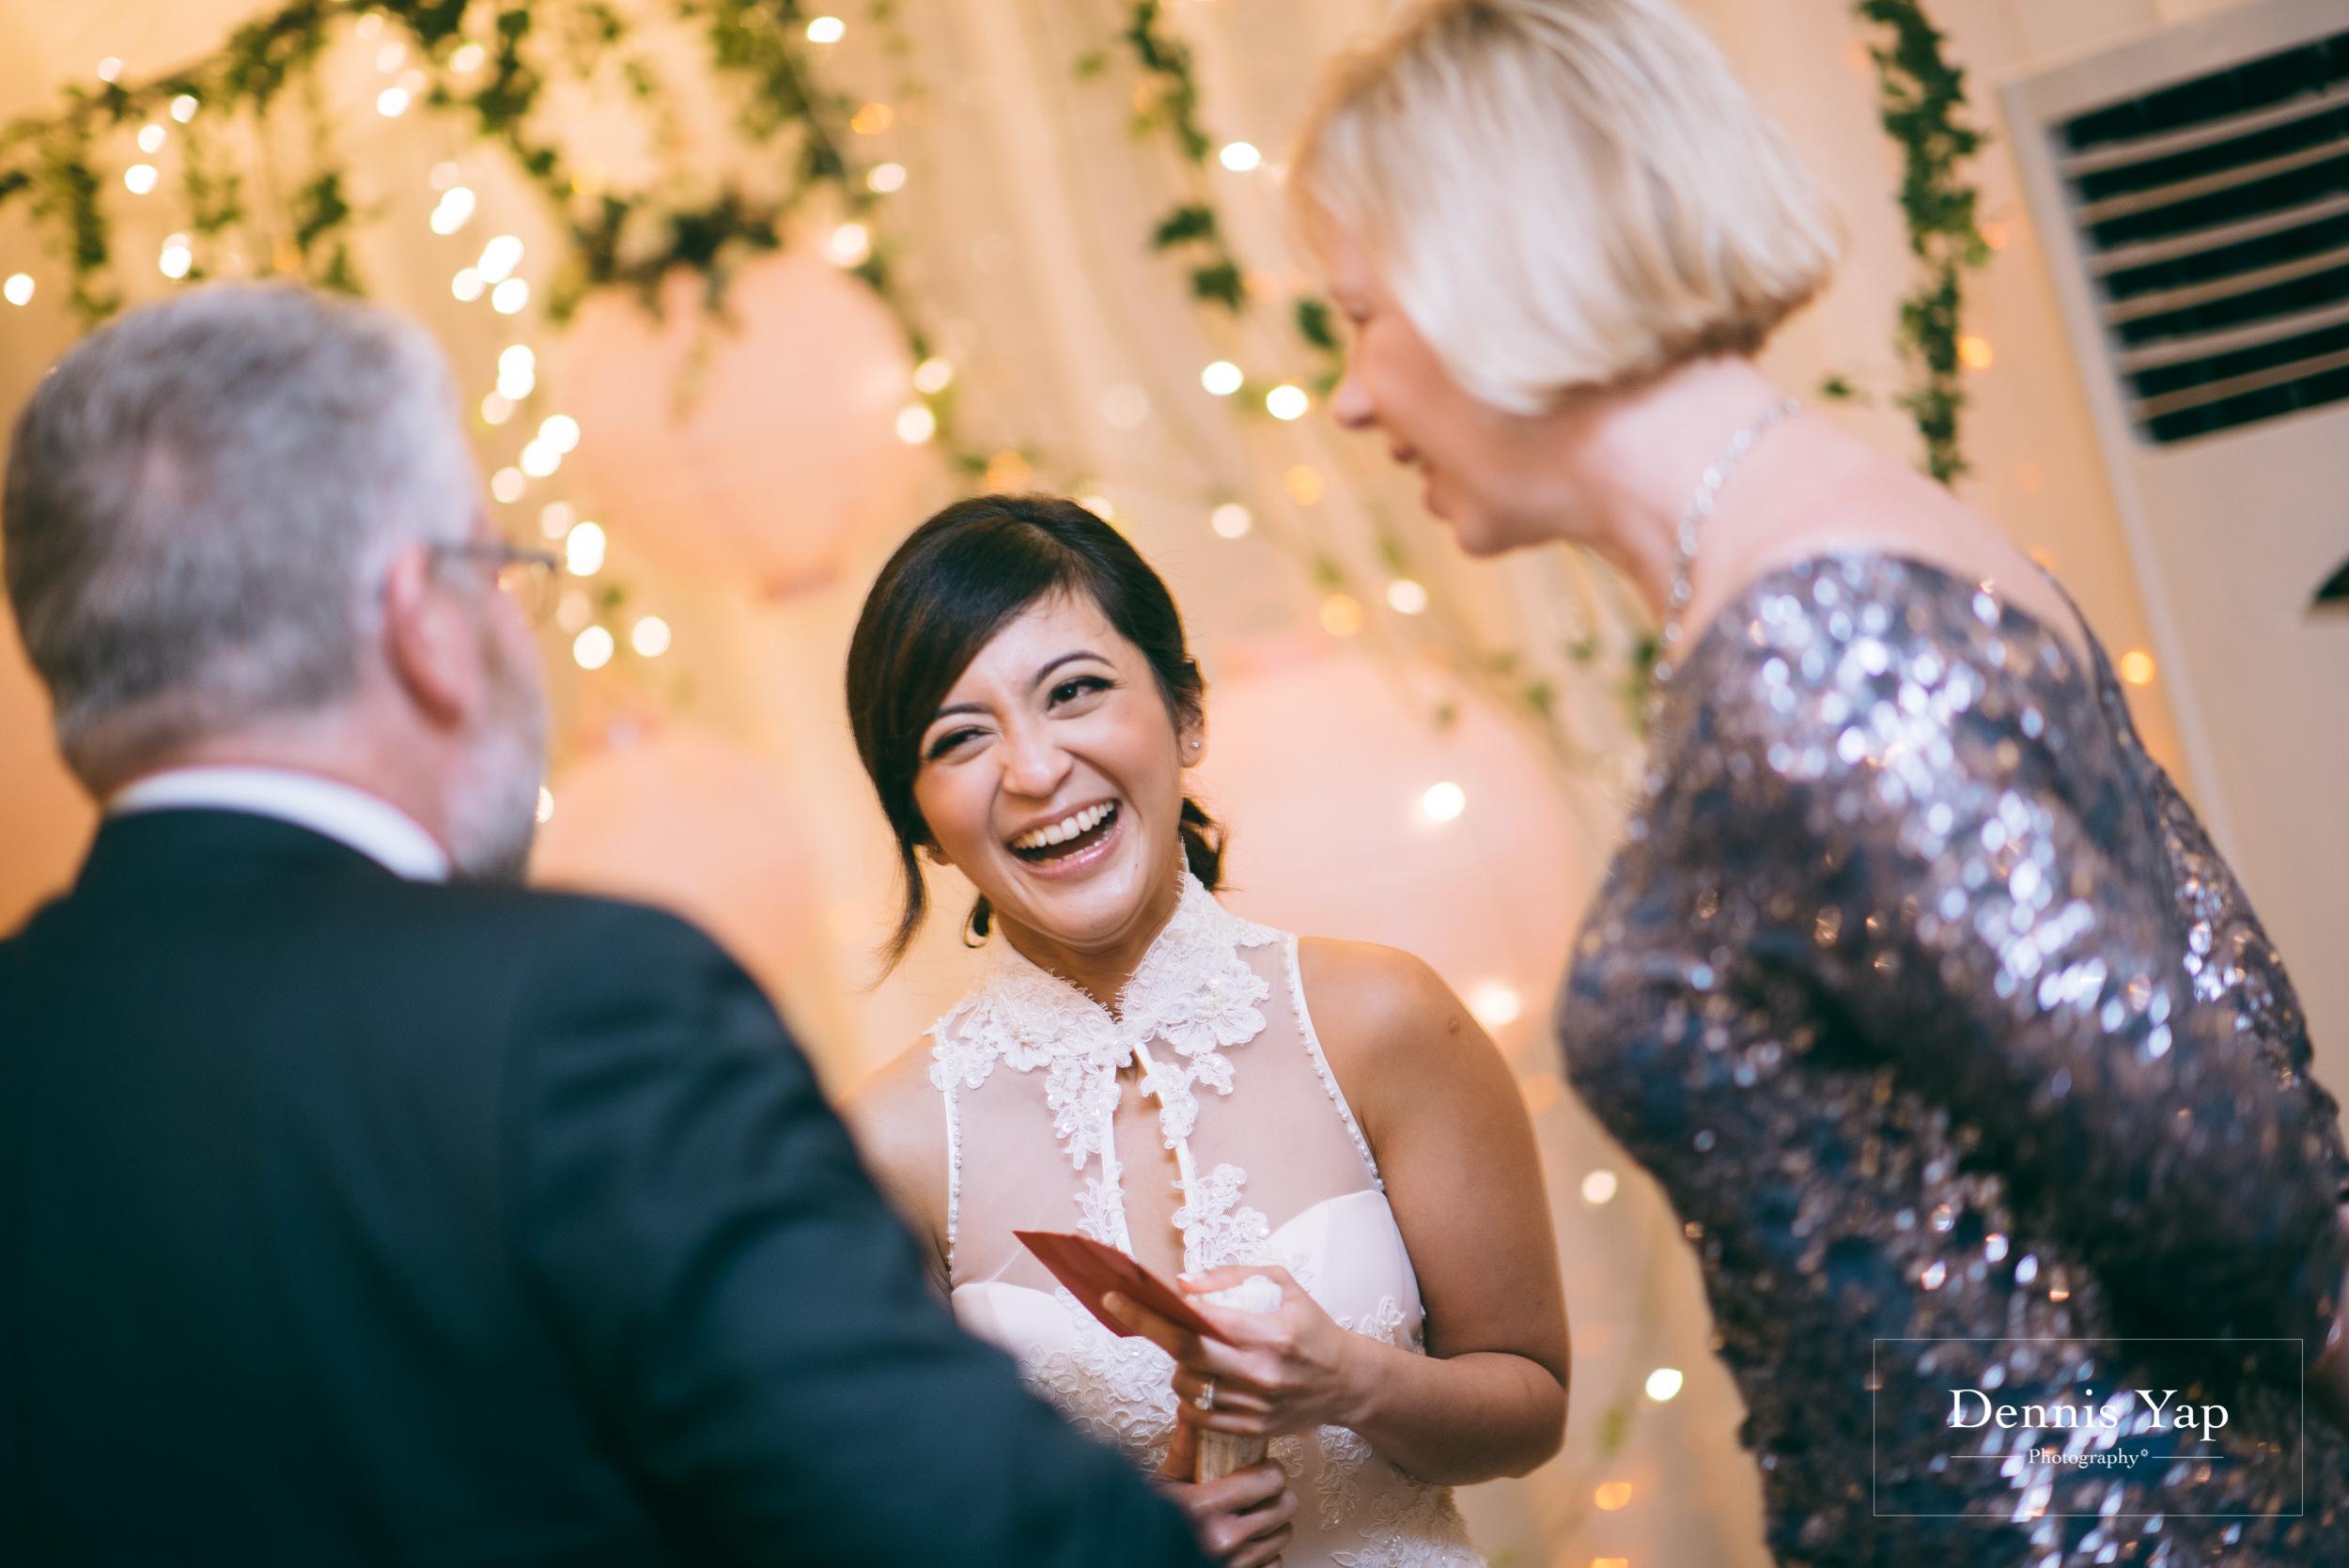 shalini yelitte wedding dinner rasa sayang resort penang dennis yap photography malaysia top wedding photographer beloved emotions flow -24.jpg